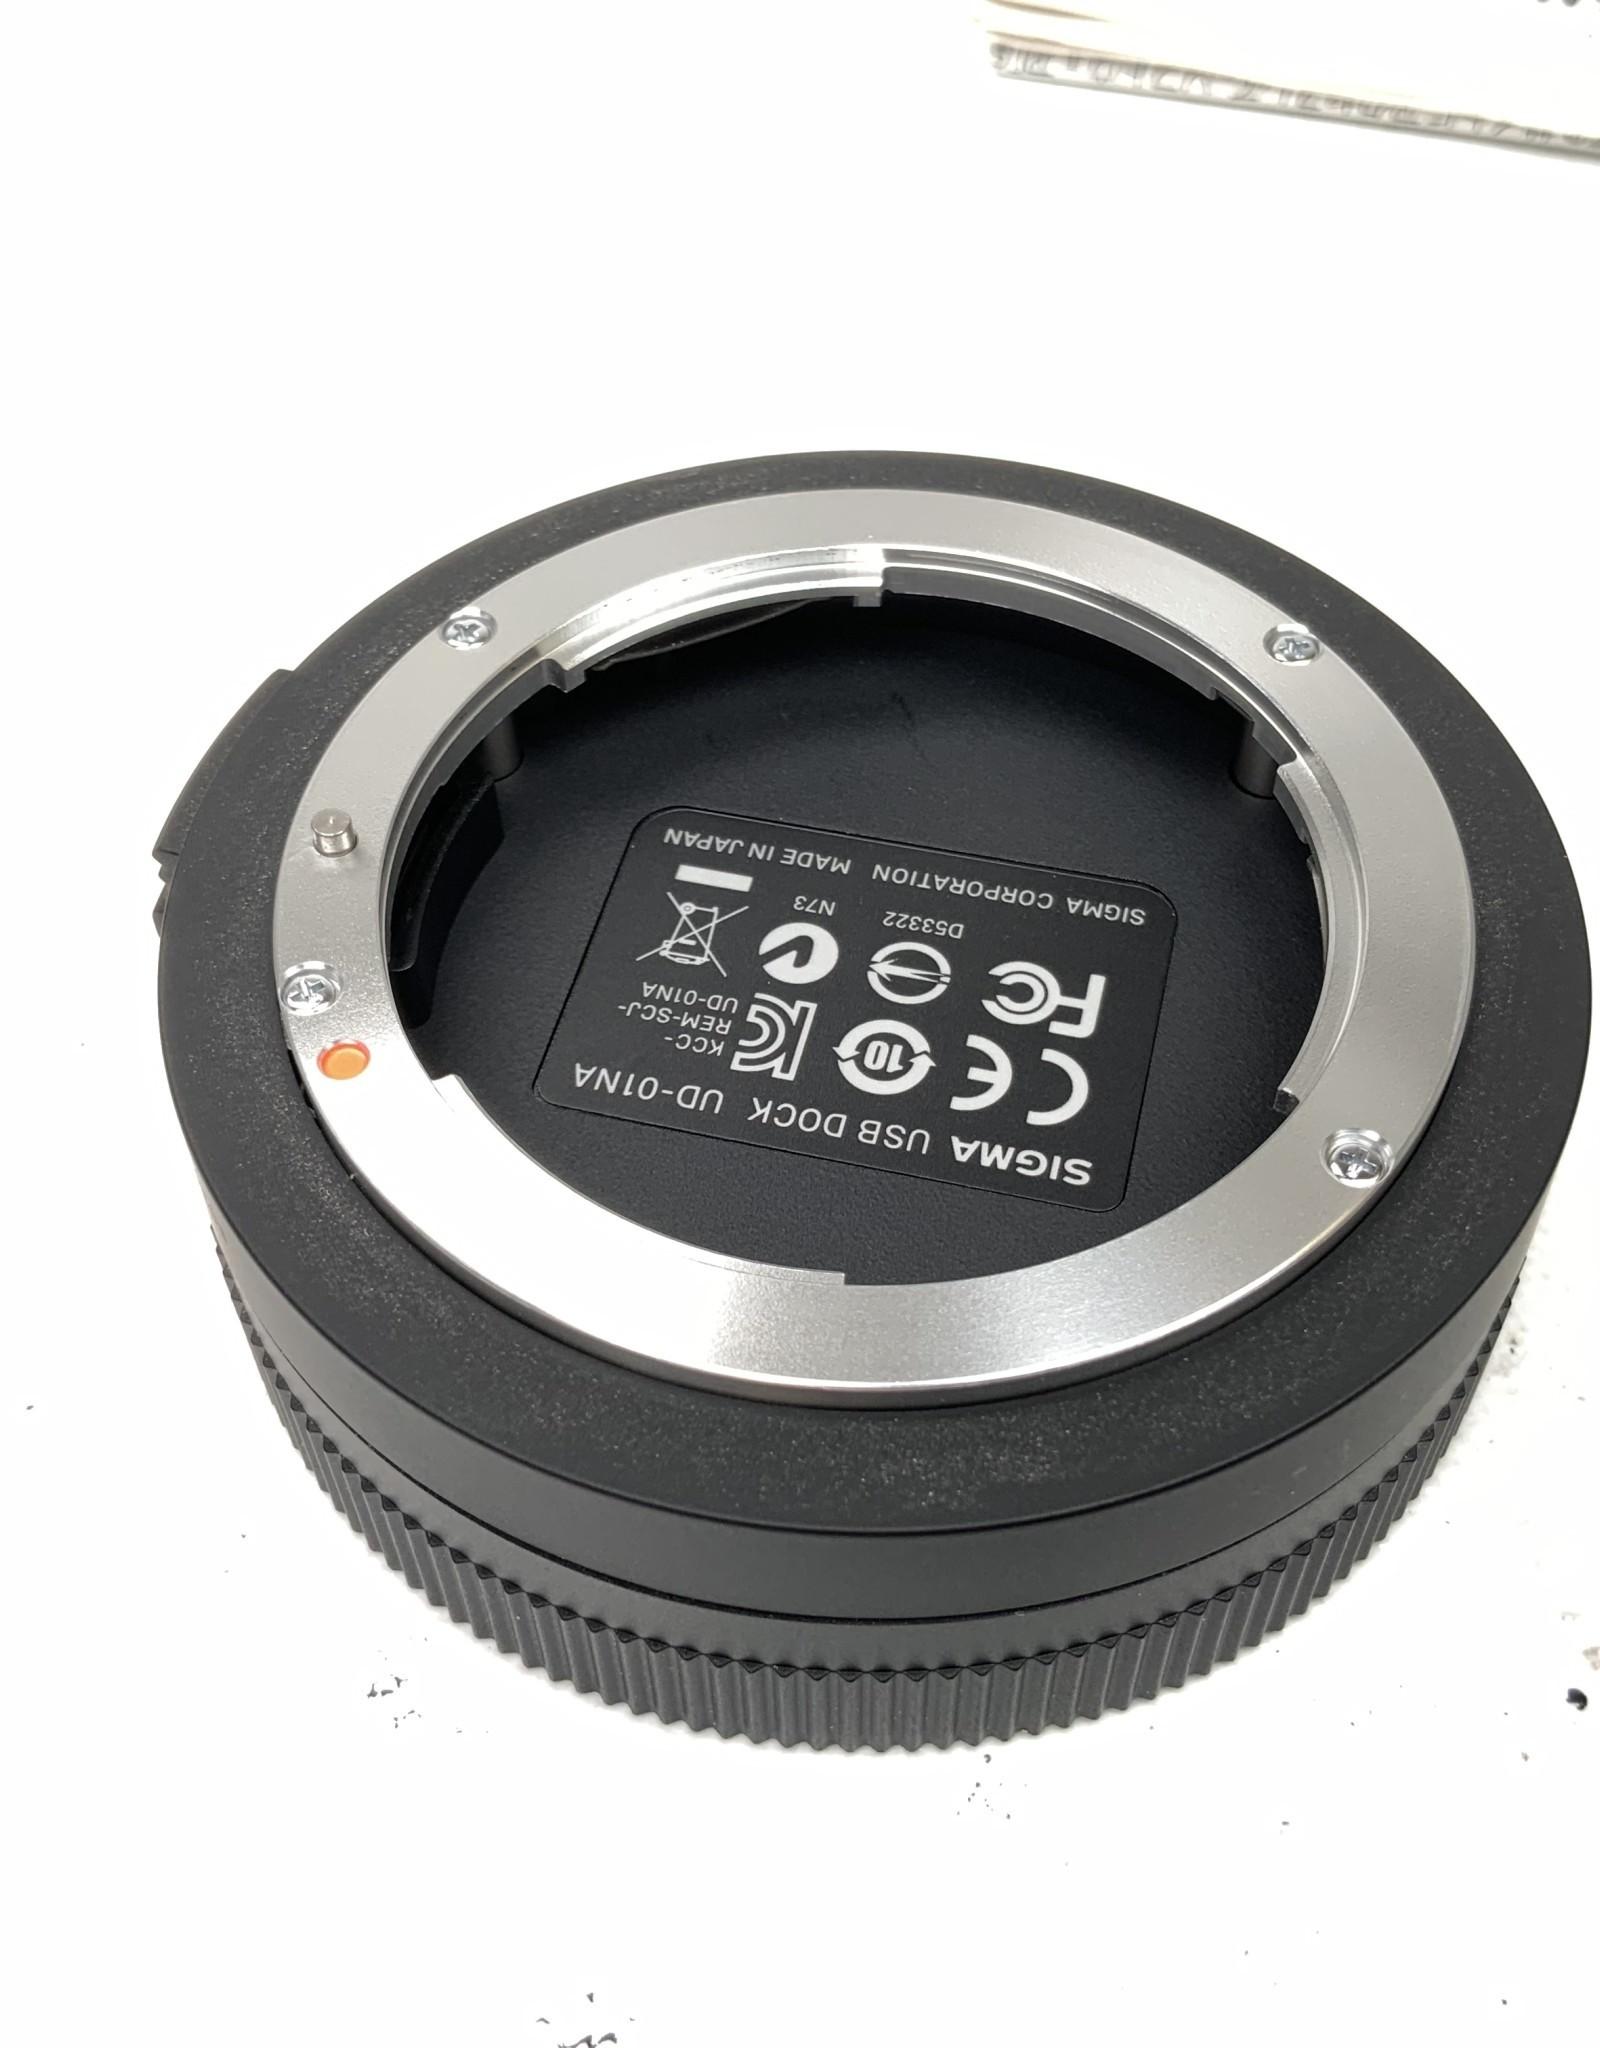 SIGMA Sigma USB Dock UD-01 for Nikon Mount in Box Used EX